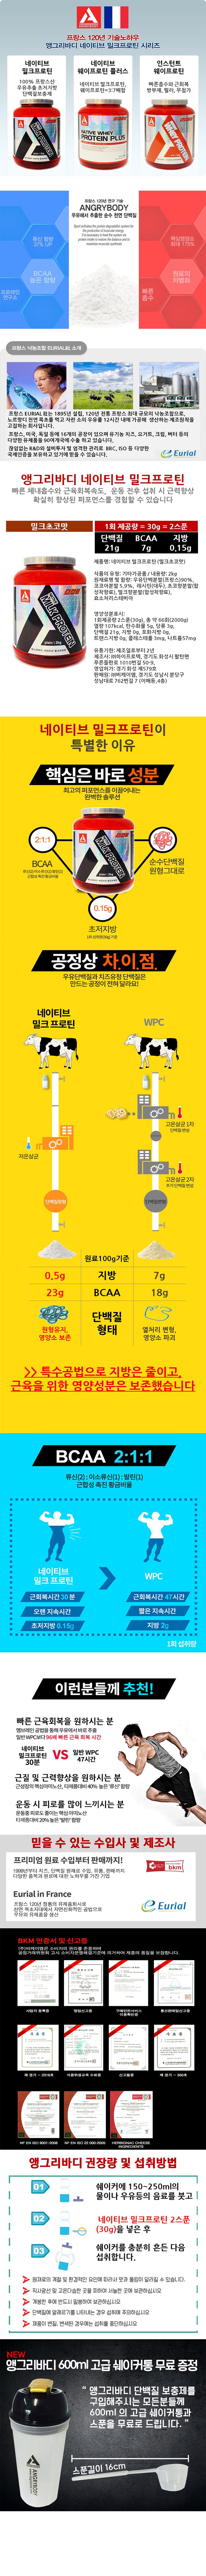 [ ANGRYBODY ] 本机牛奶蛋白 Choco 2公斤